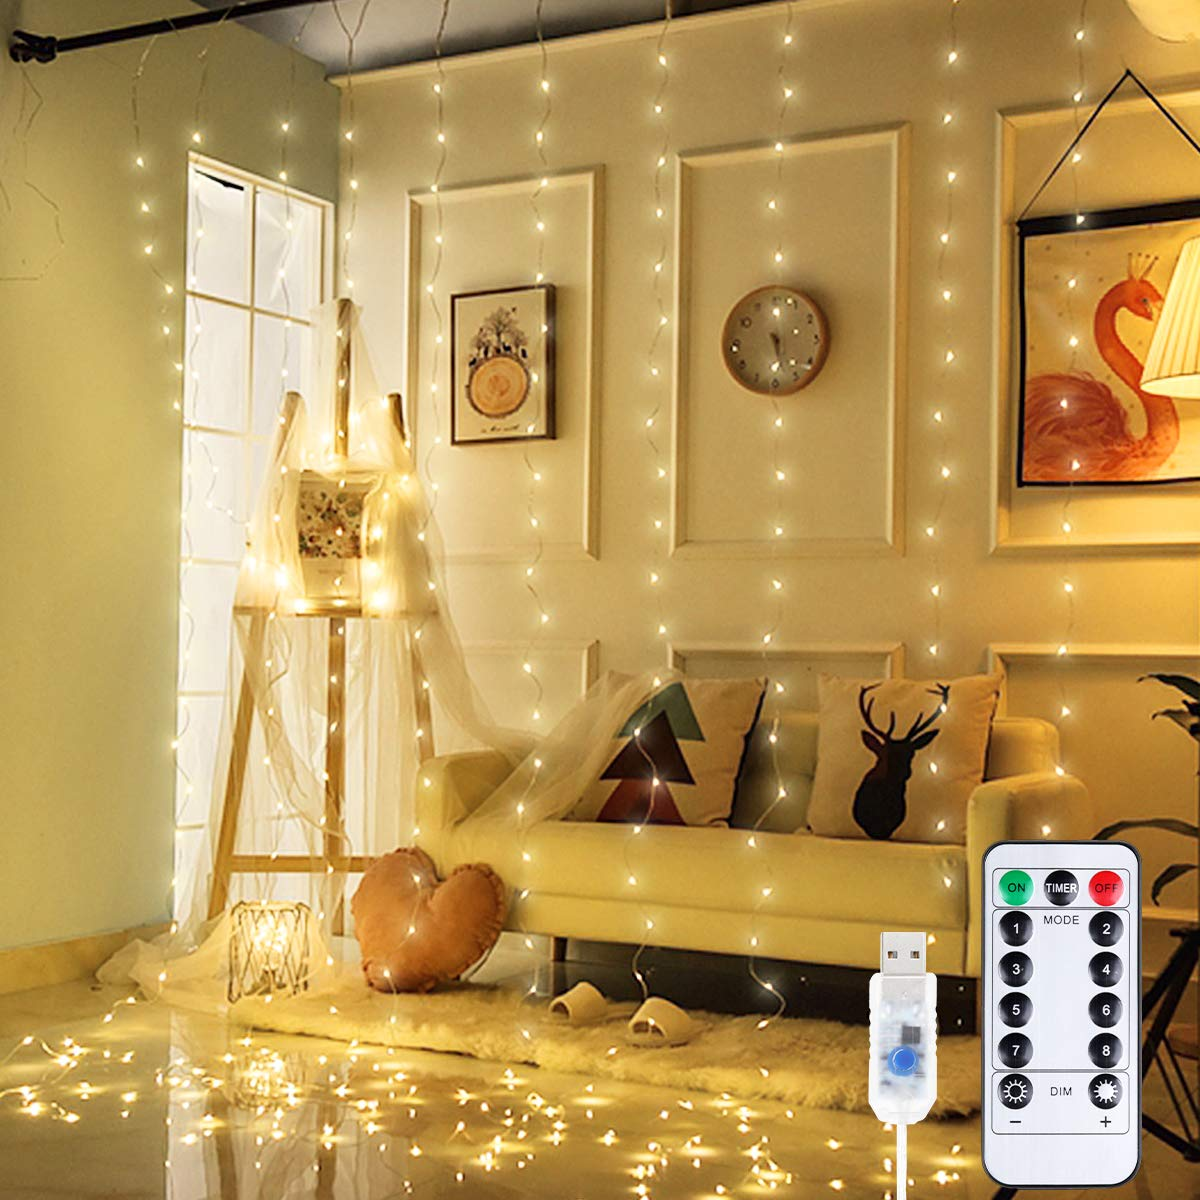 Anpro LED Curtain Lights, 300 LED Warm White Window Fairy String Lights